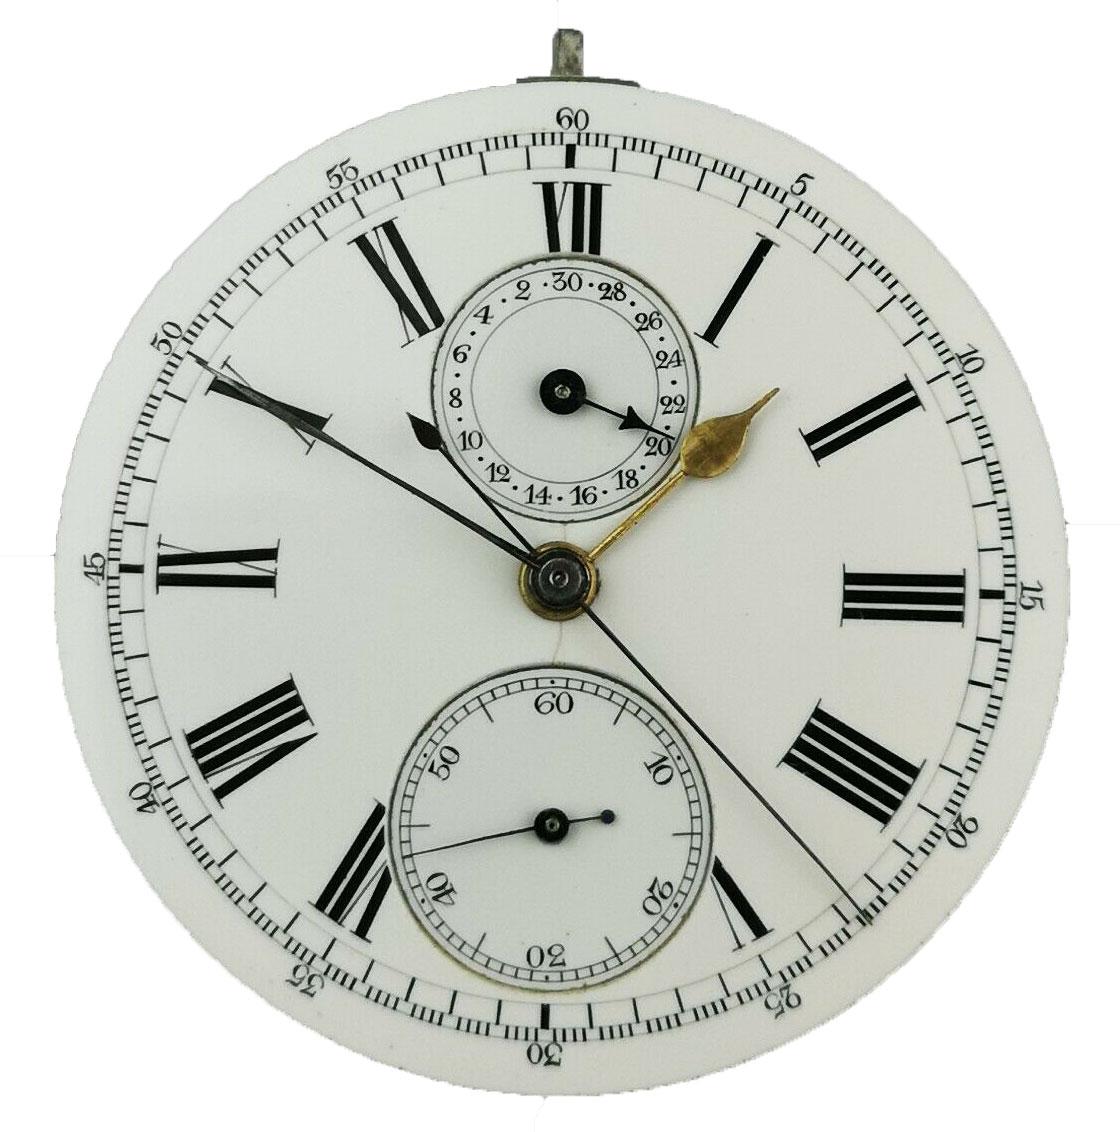 AH Arnold & FH Huguenin Patent Chronograph Movement